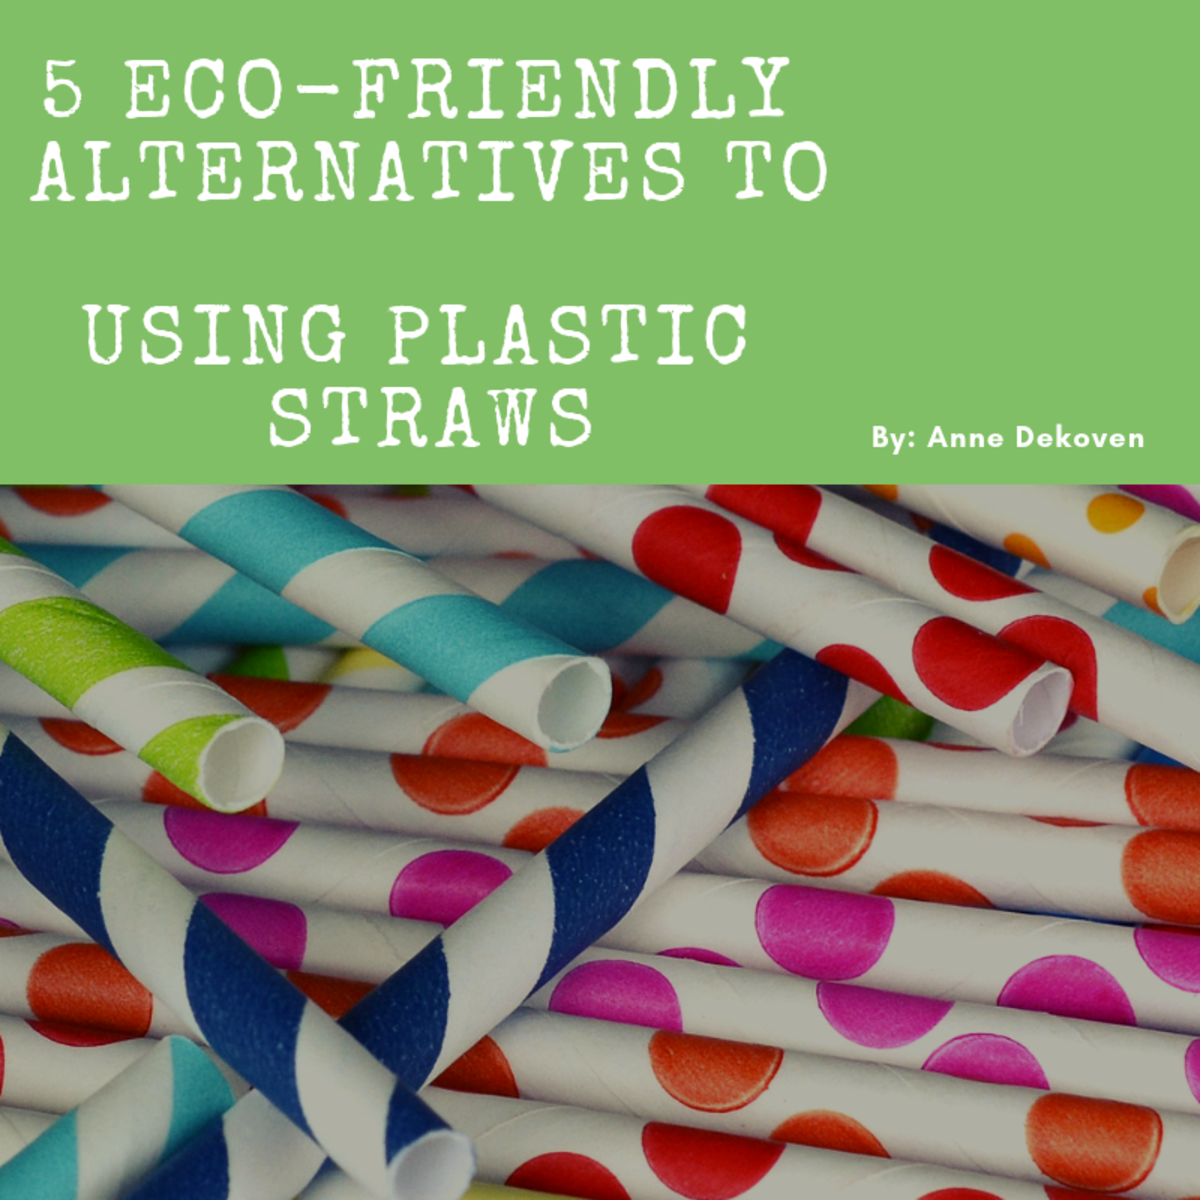 5 Eco-Friendly Alternatives to Using Plastic Straws